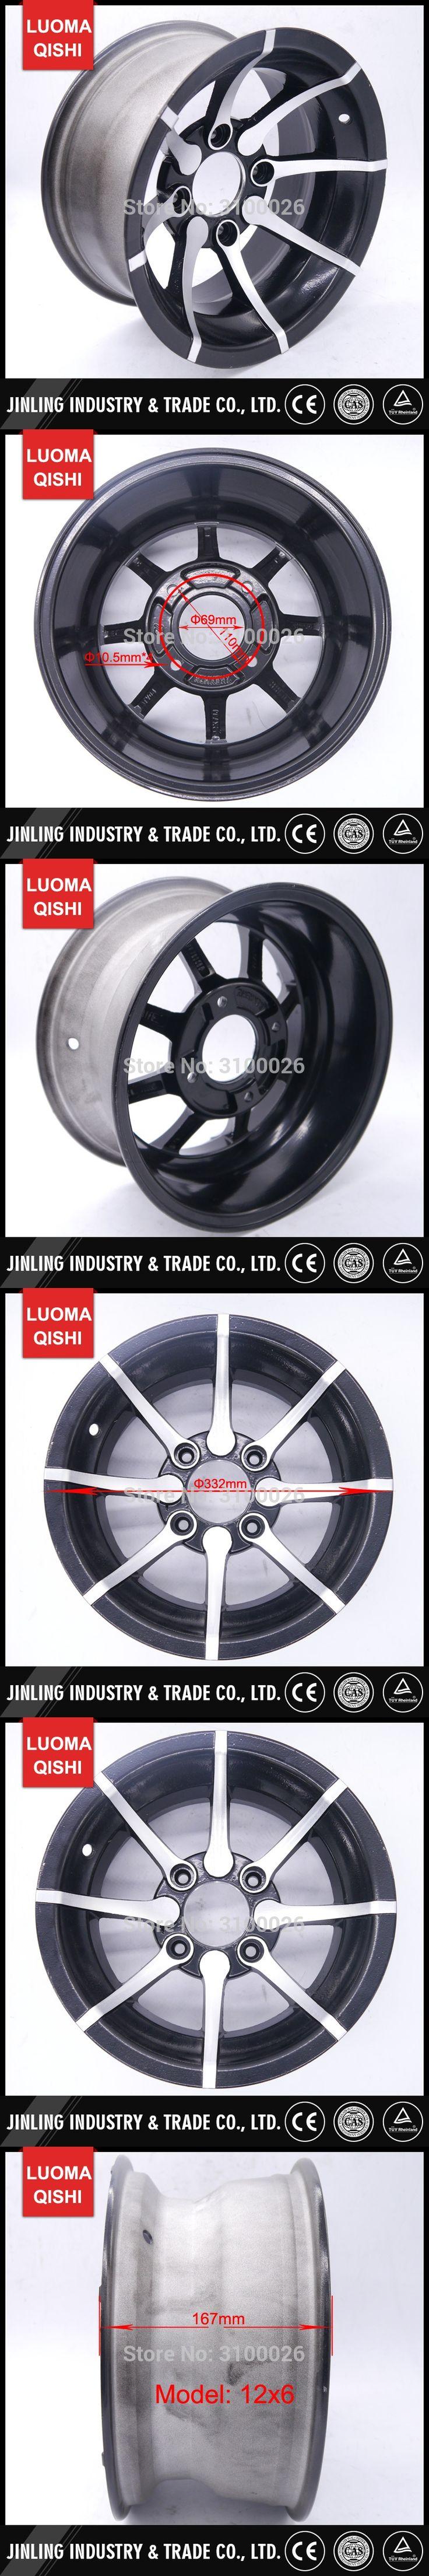 12x6 Alloy Aluminium Rim Fit for 12 inch Tire Wheel 205/30-12 Racing Road ATV Quad Bike UTV Buggy Go Kart Karting parts